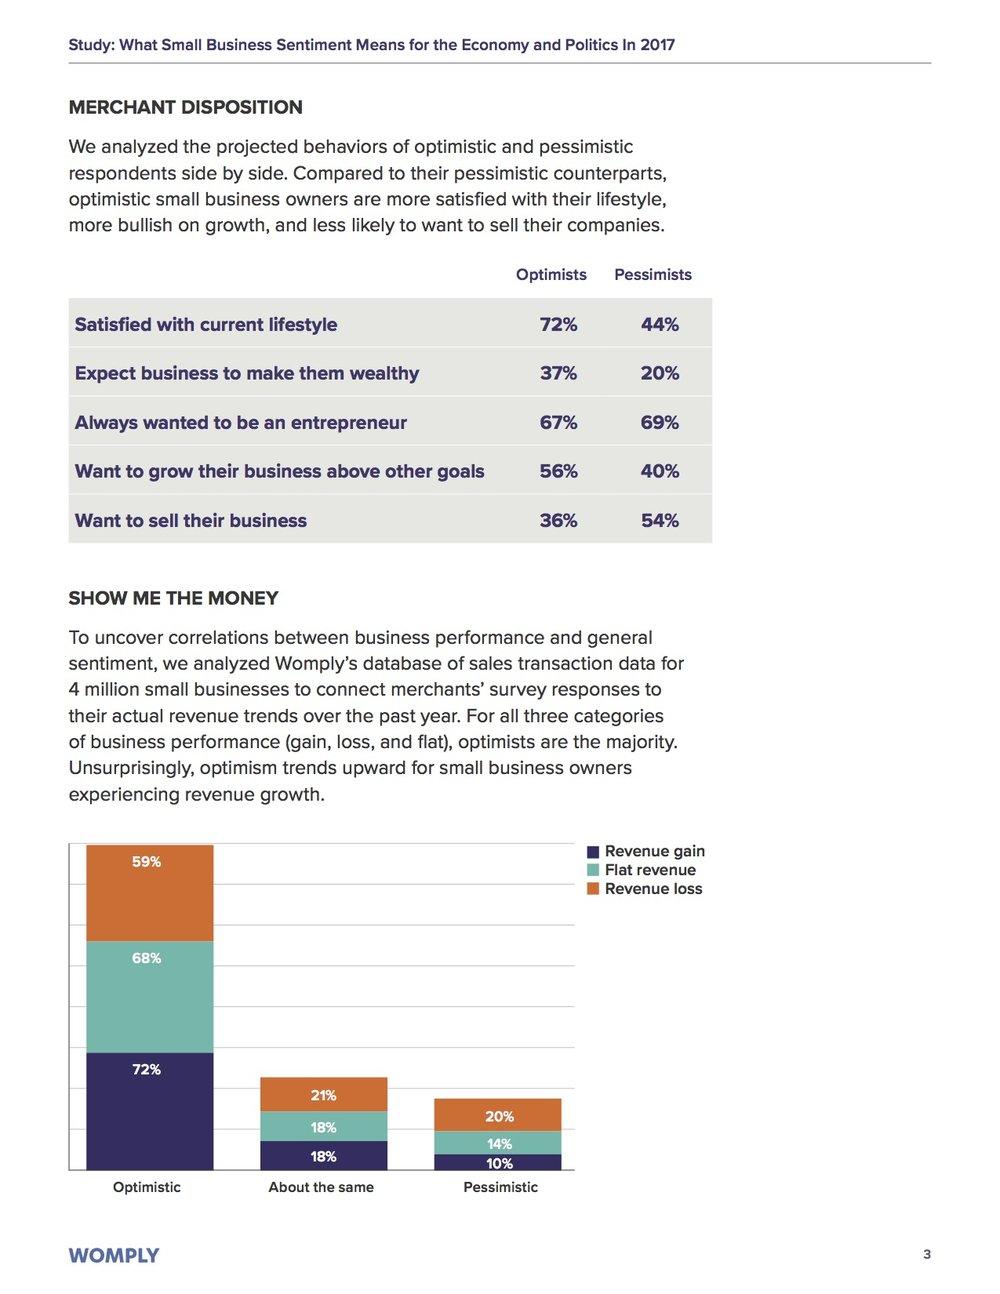 small-business-disposition-revenue